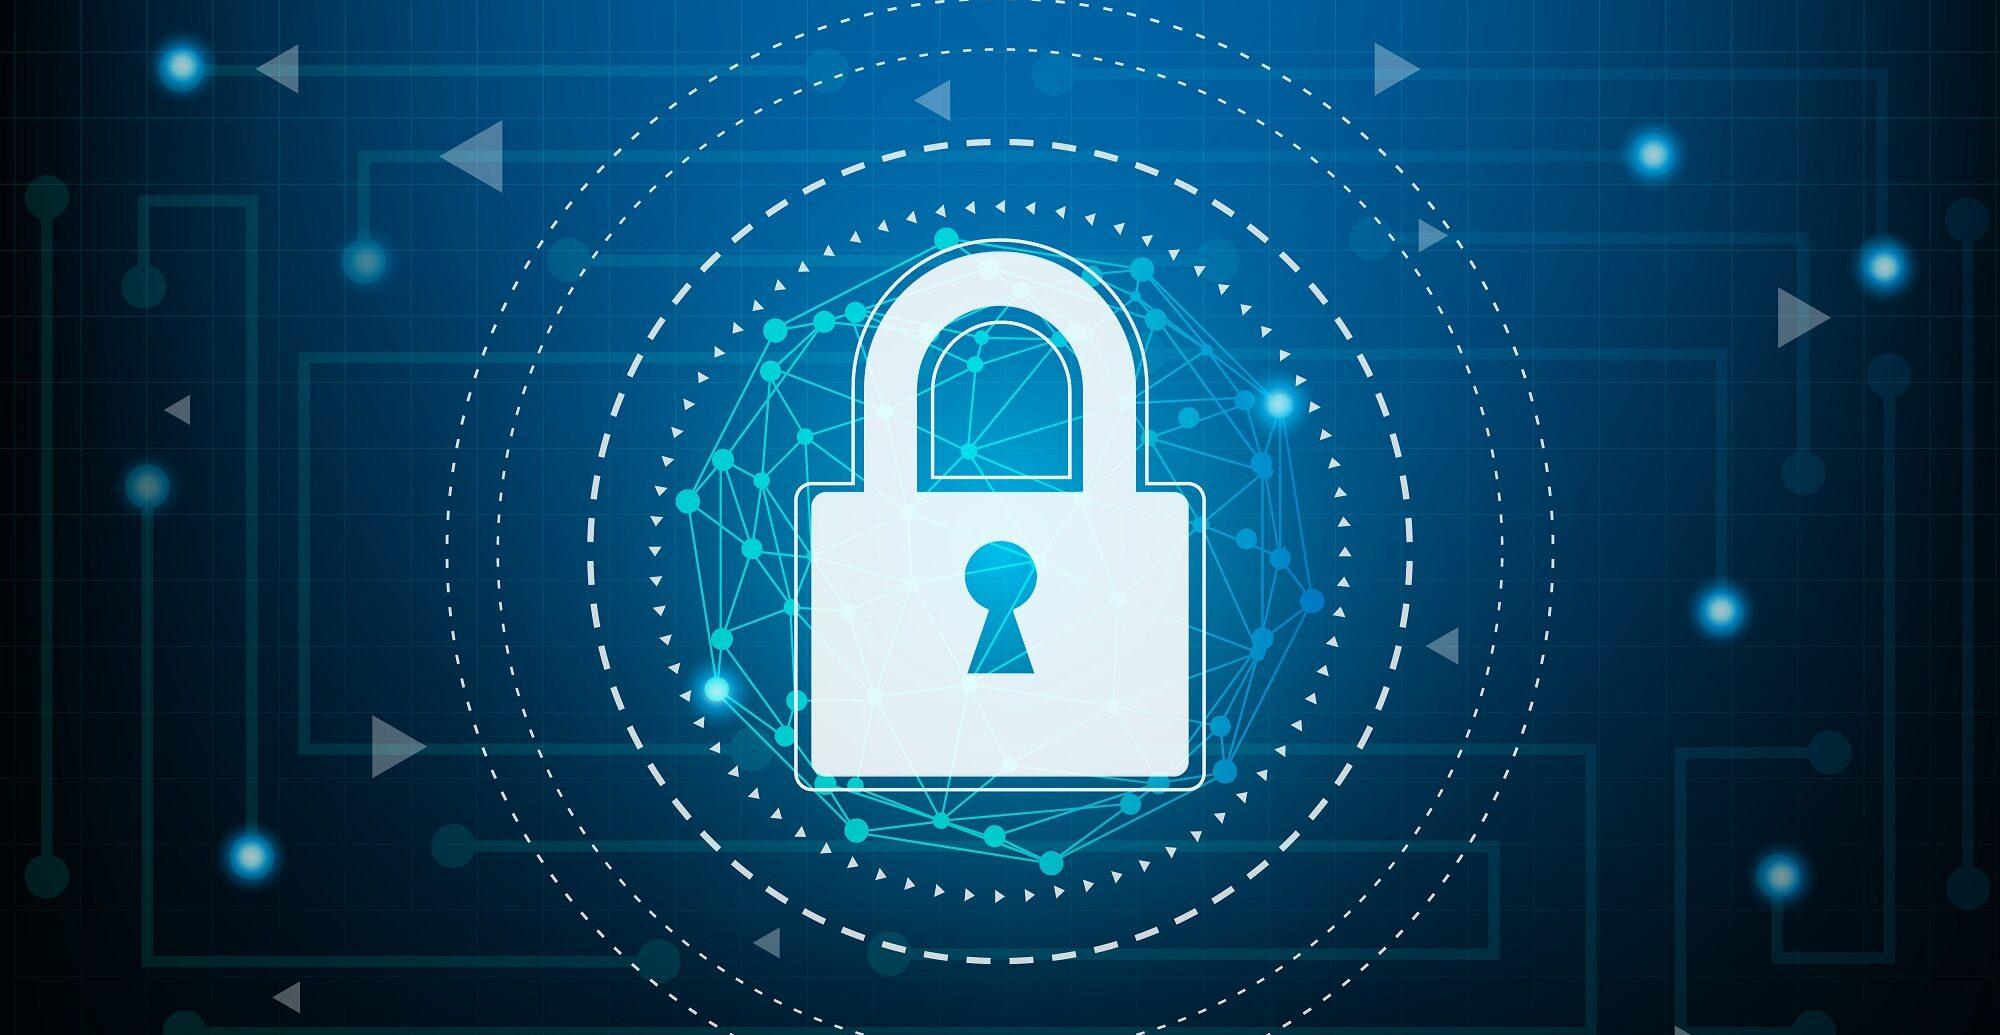 Proteccion Datos Proceso Penal